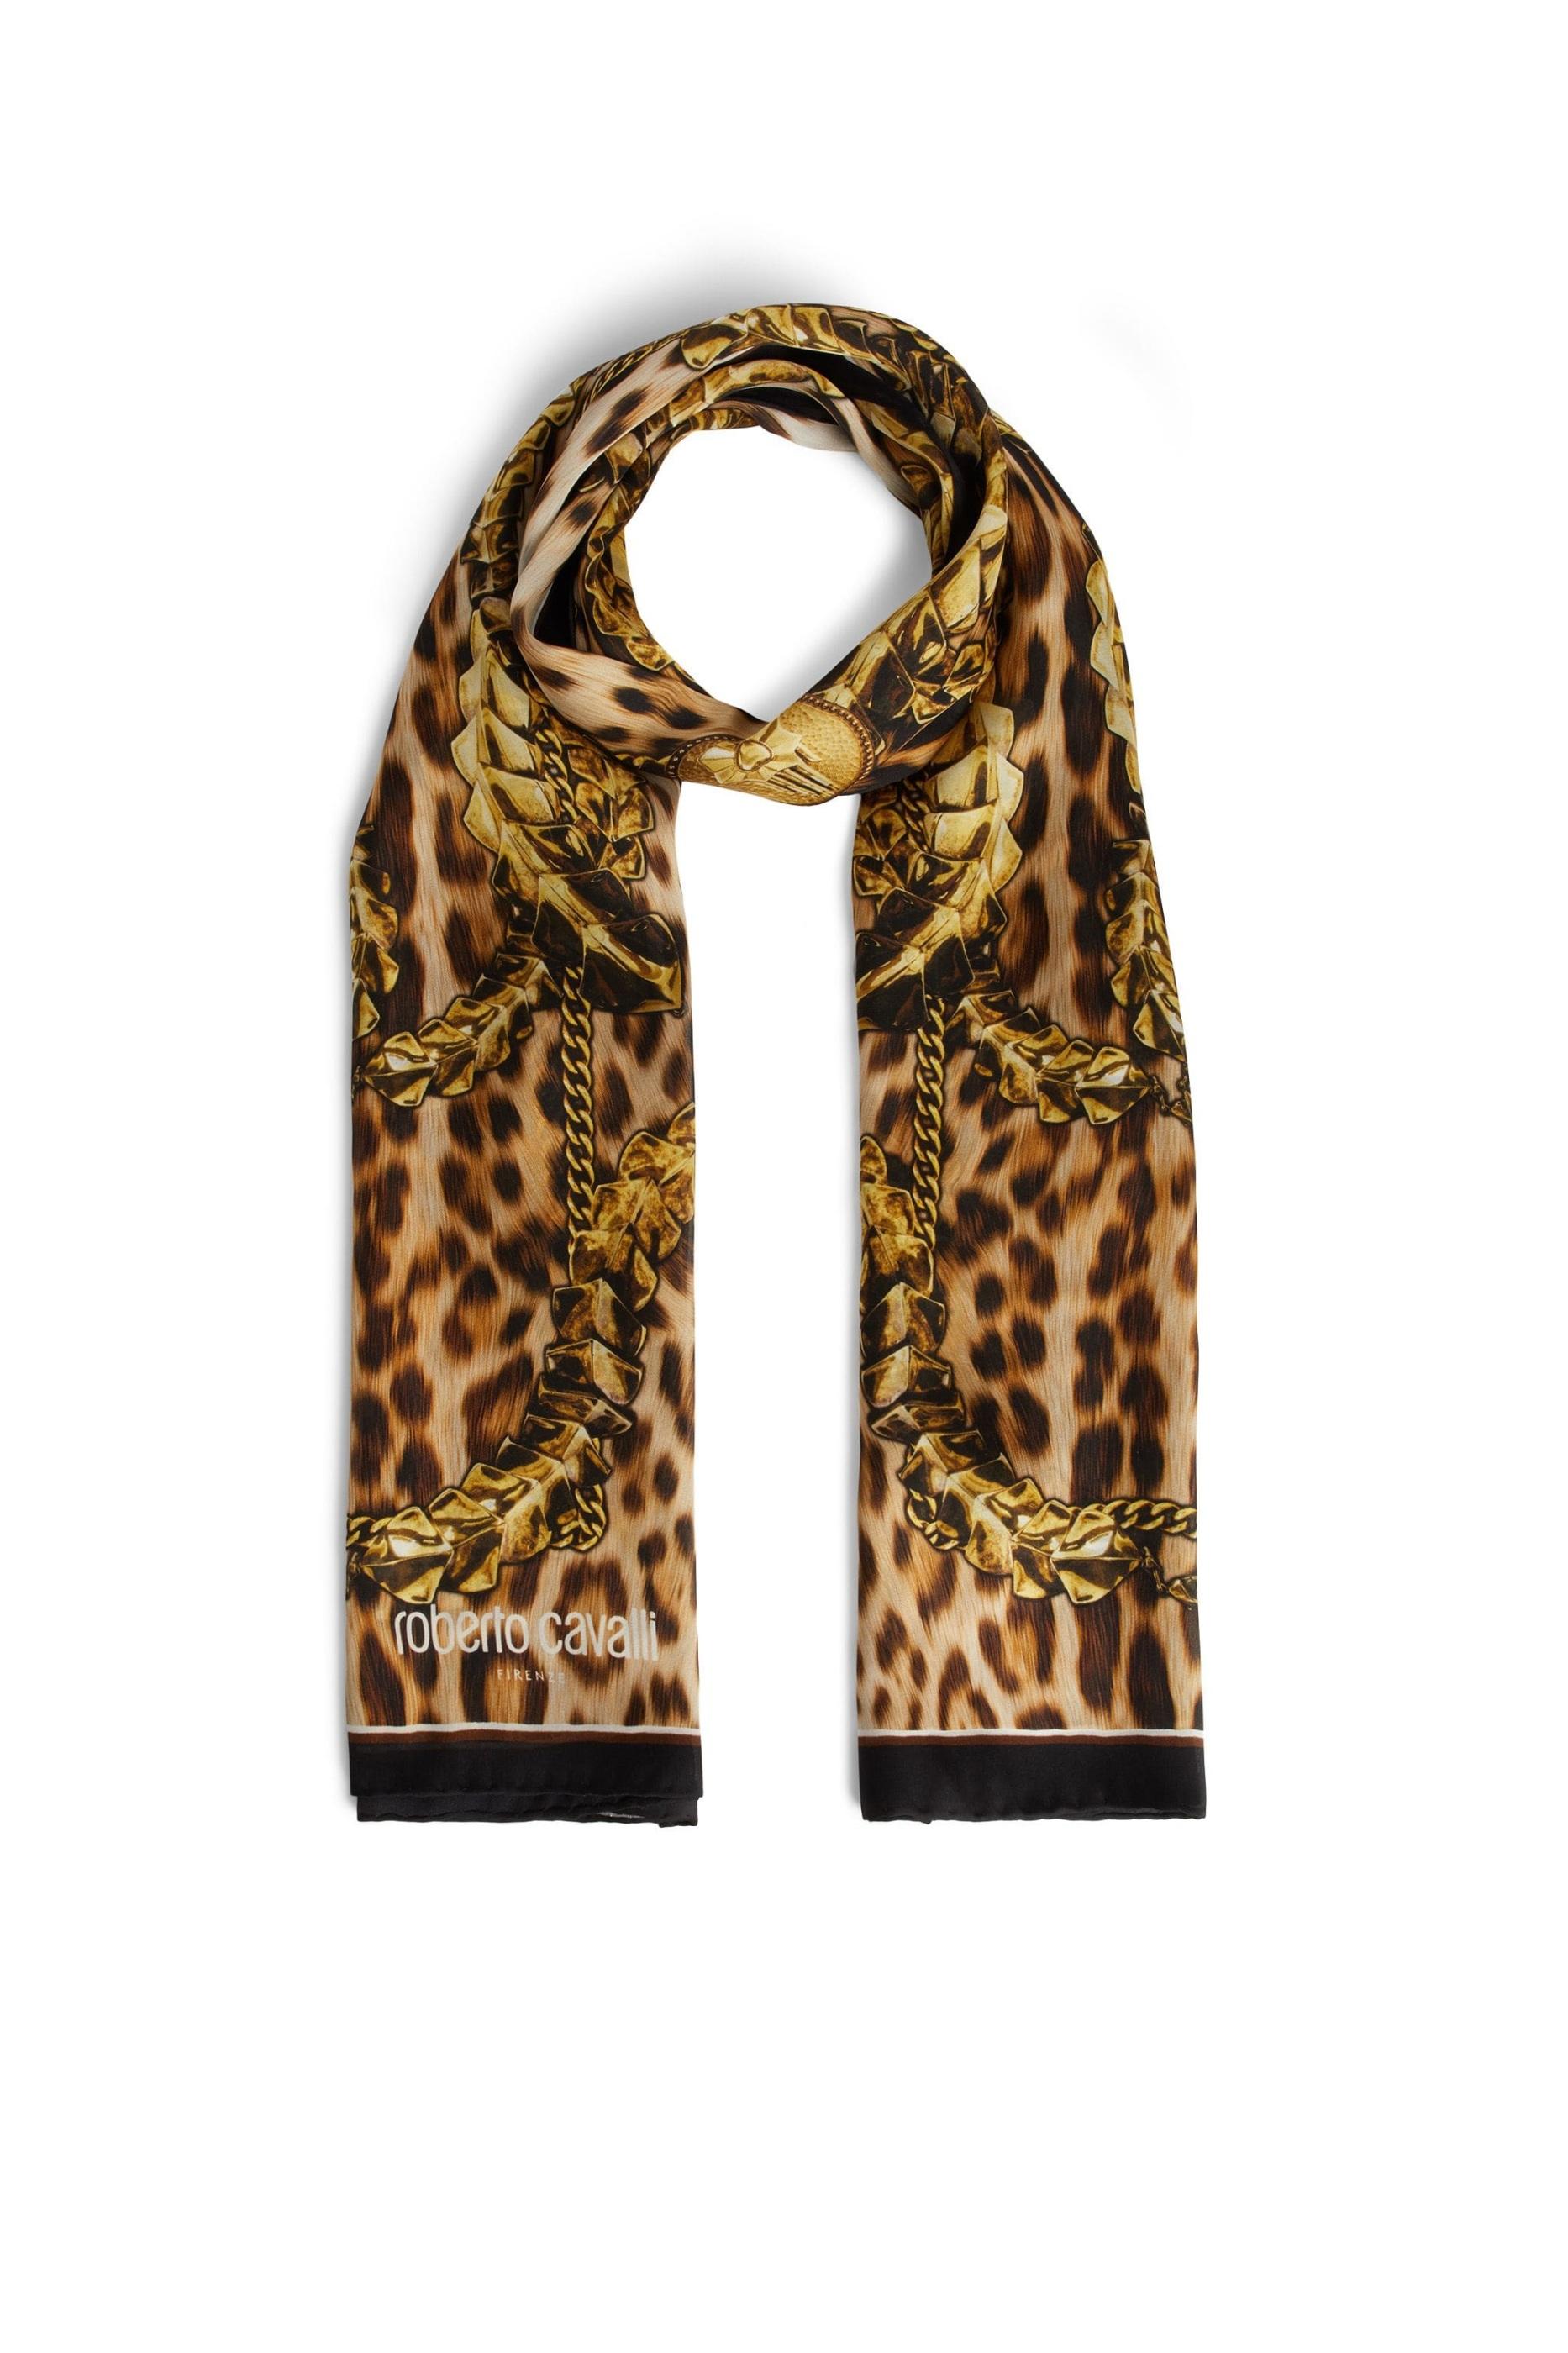 roberto-cavalli-heritage-jaguar-jewels-print-stole_13964144_18908472_2048